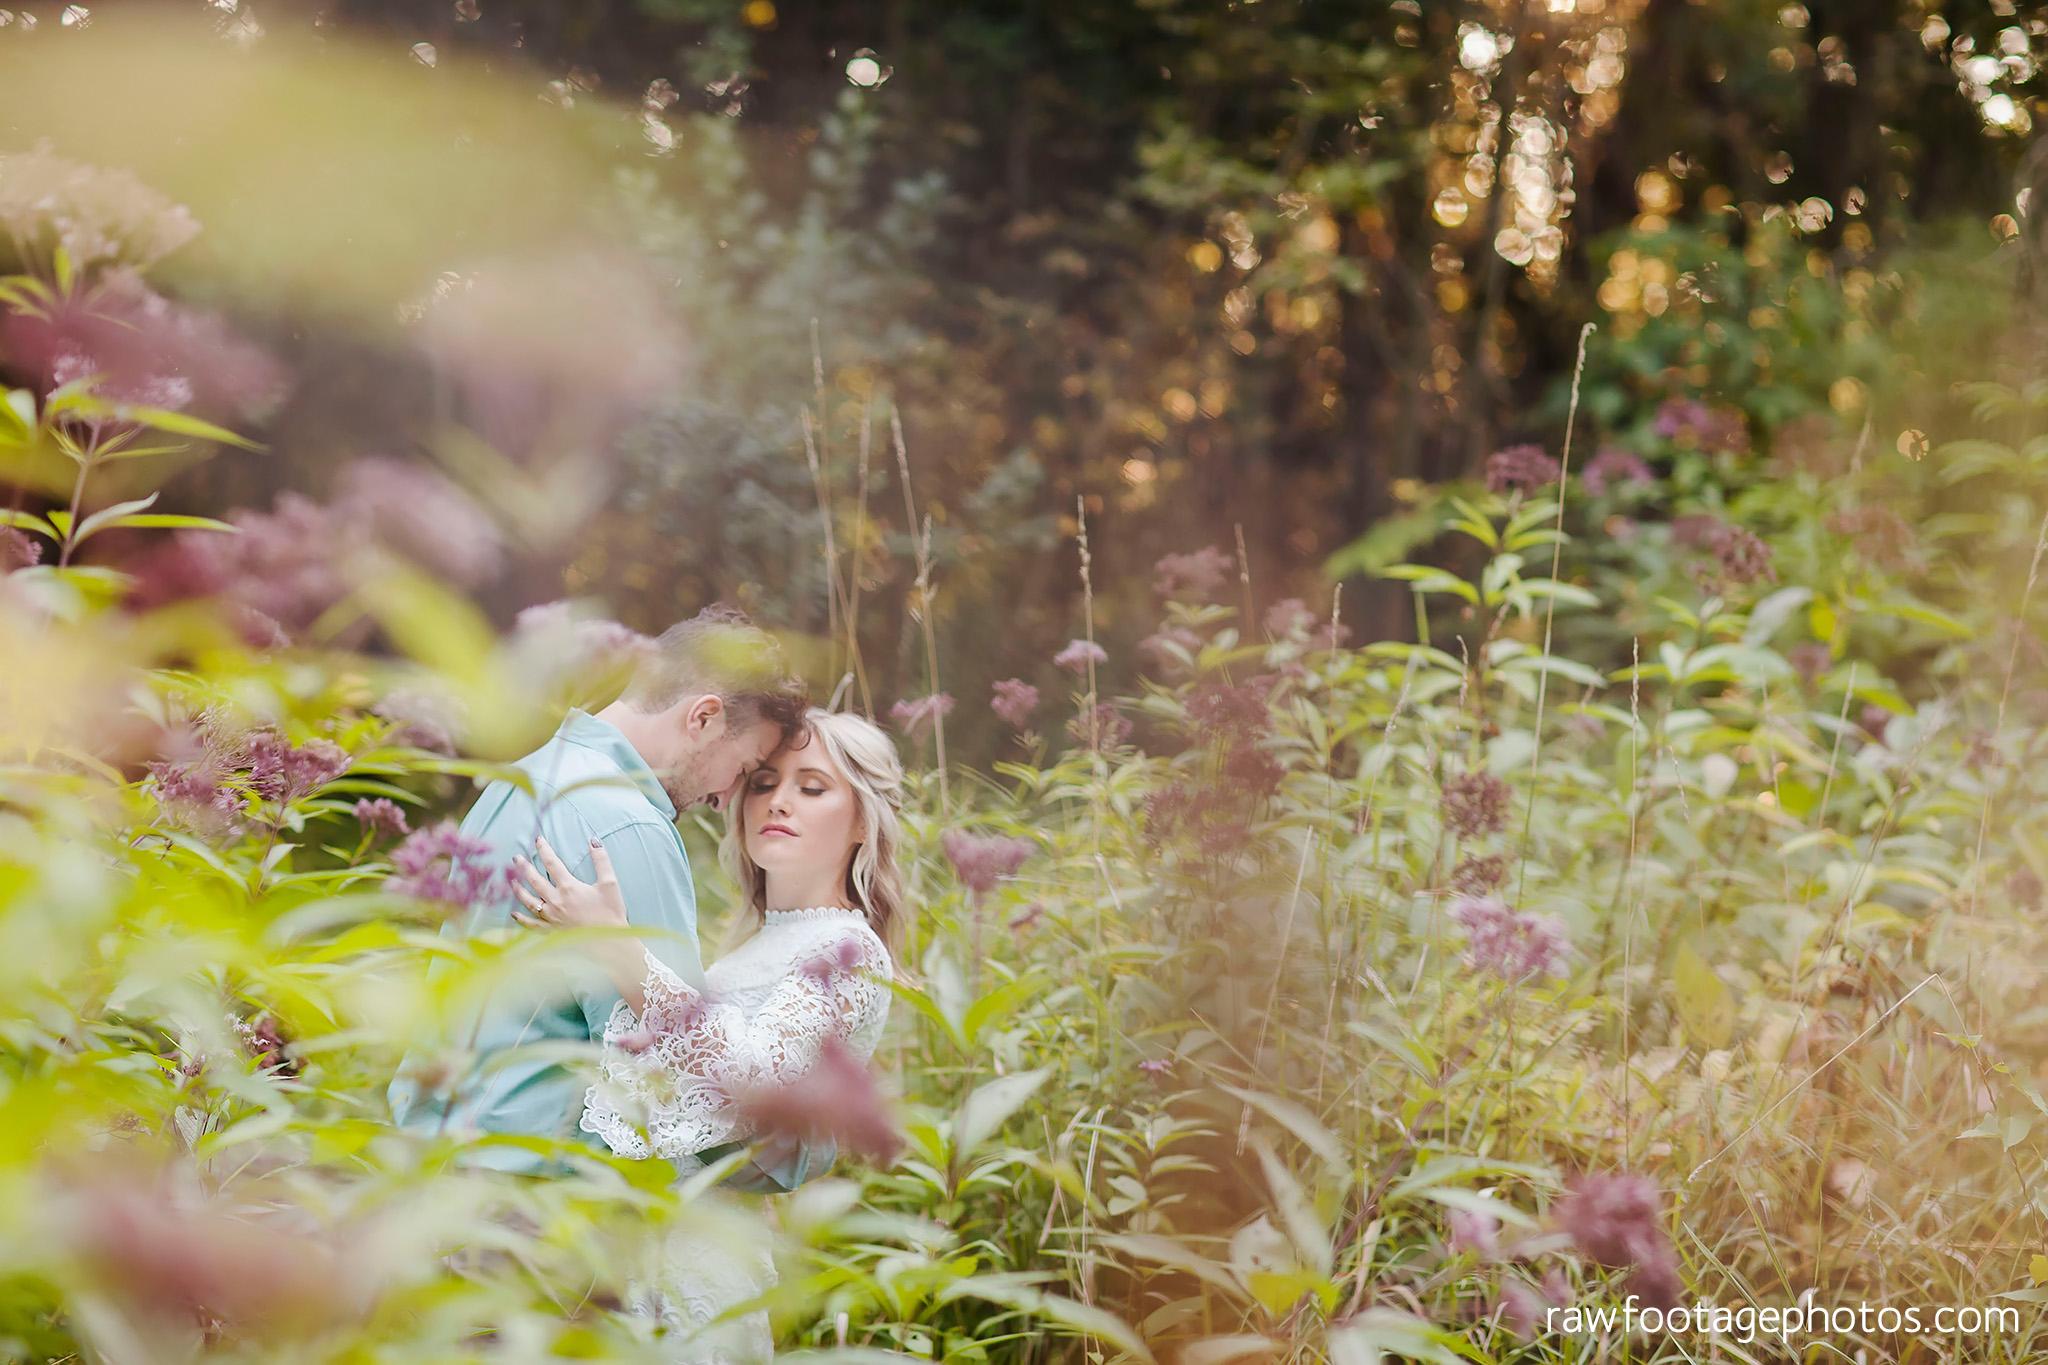 london_ontario_wedding_photographer-raw_footage_photography-engagement_session-uwo-campus-gibbons_park-woods028.jpg